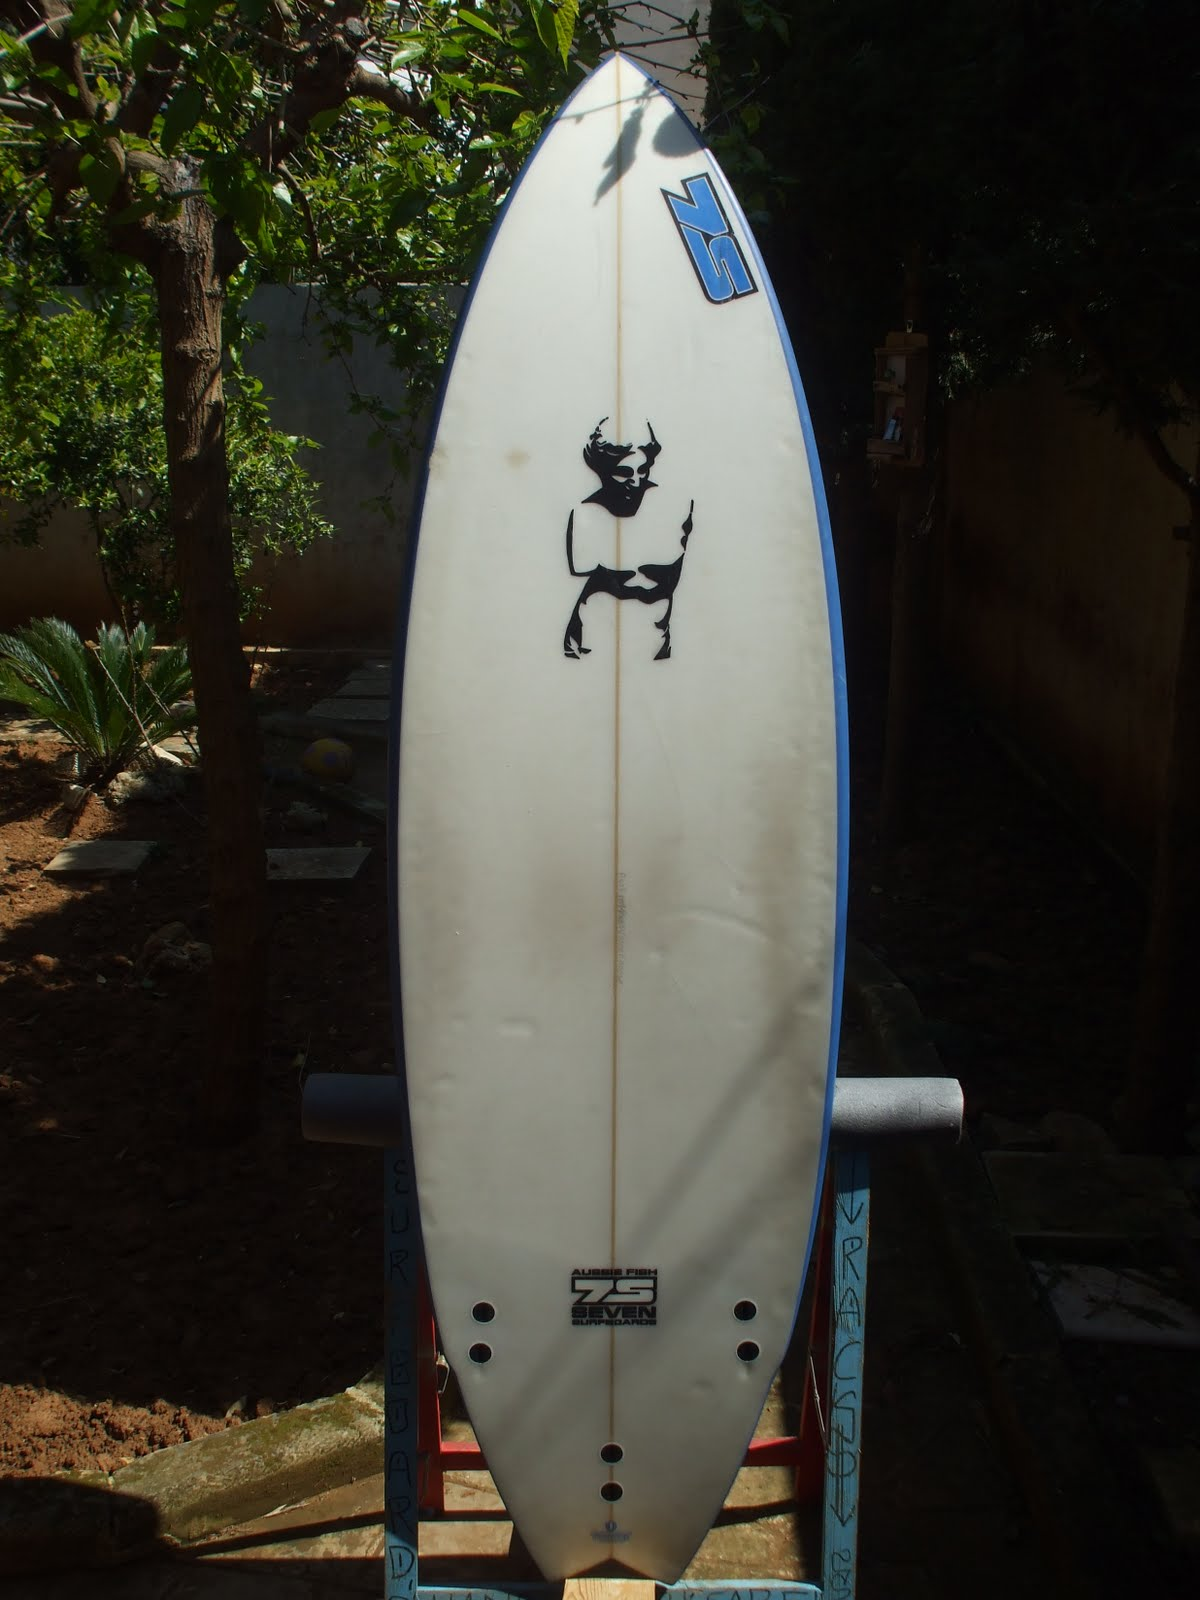 Brindisi surf club tavole usate in vendita - Misure tavole da surf ...